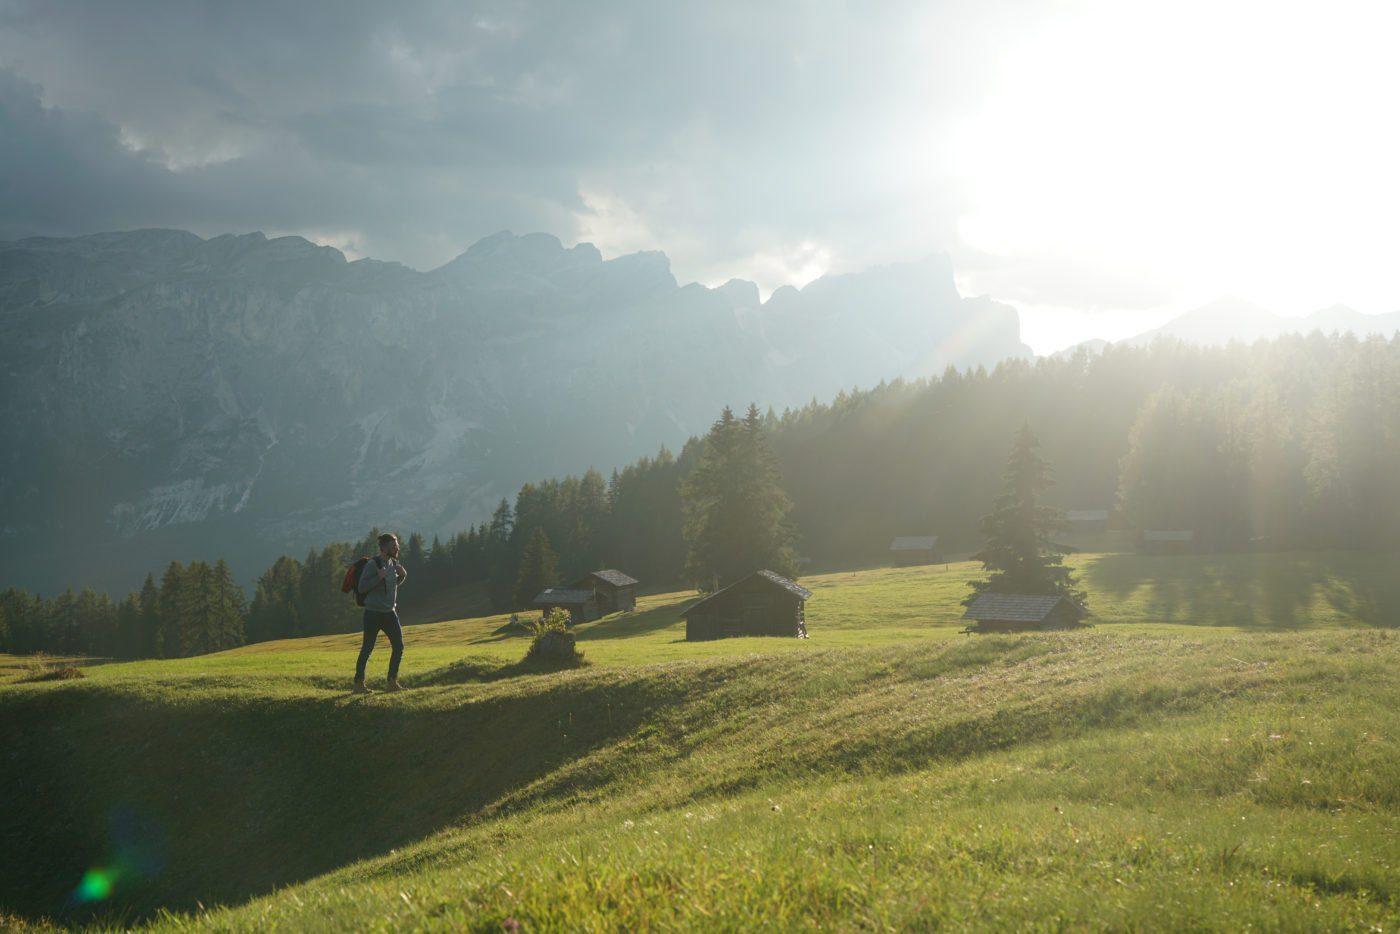 Armentara, famous Instagram location in South Tyrol